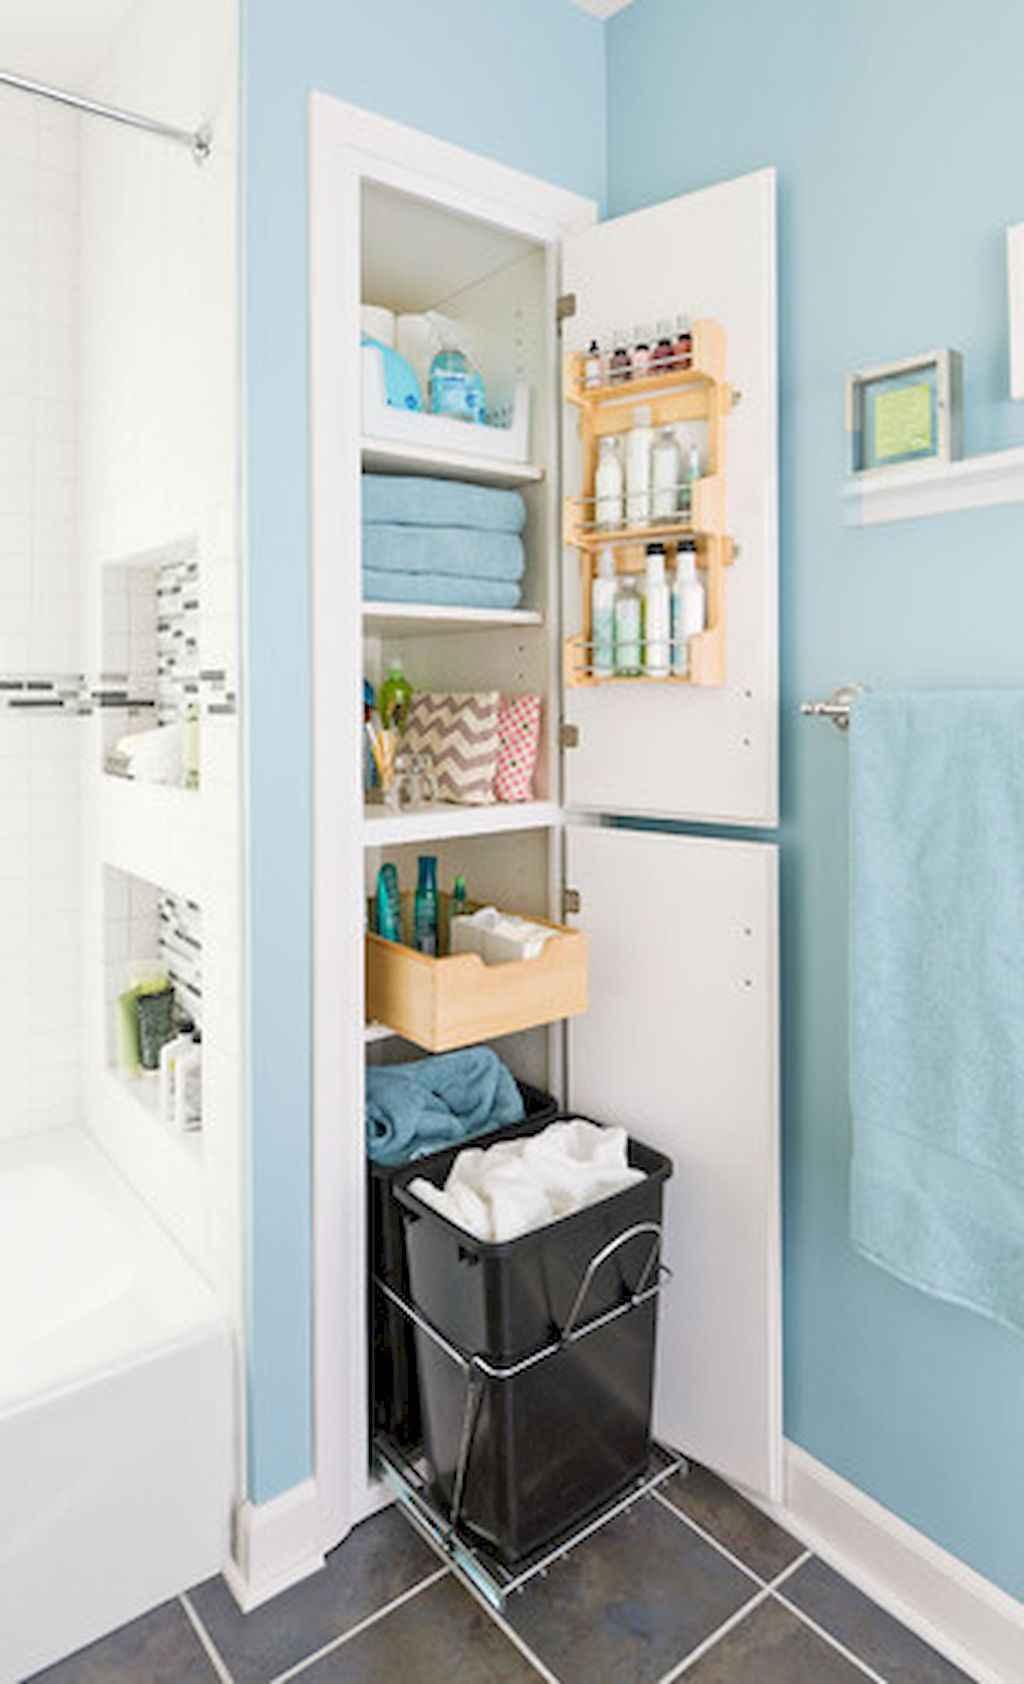 Inspiring apartment bathroom remodel ideas on a budget (24)